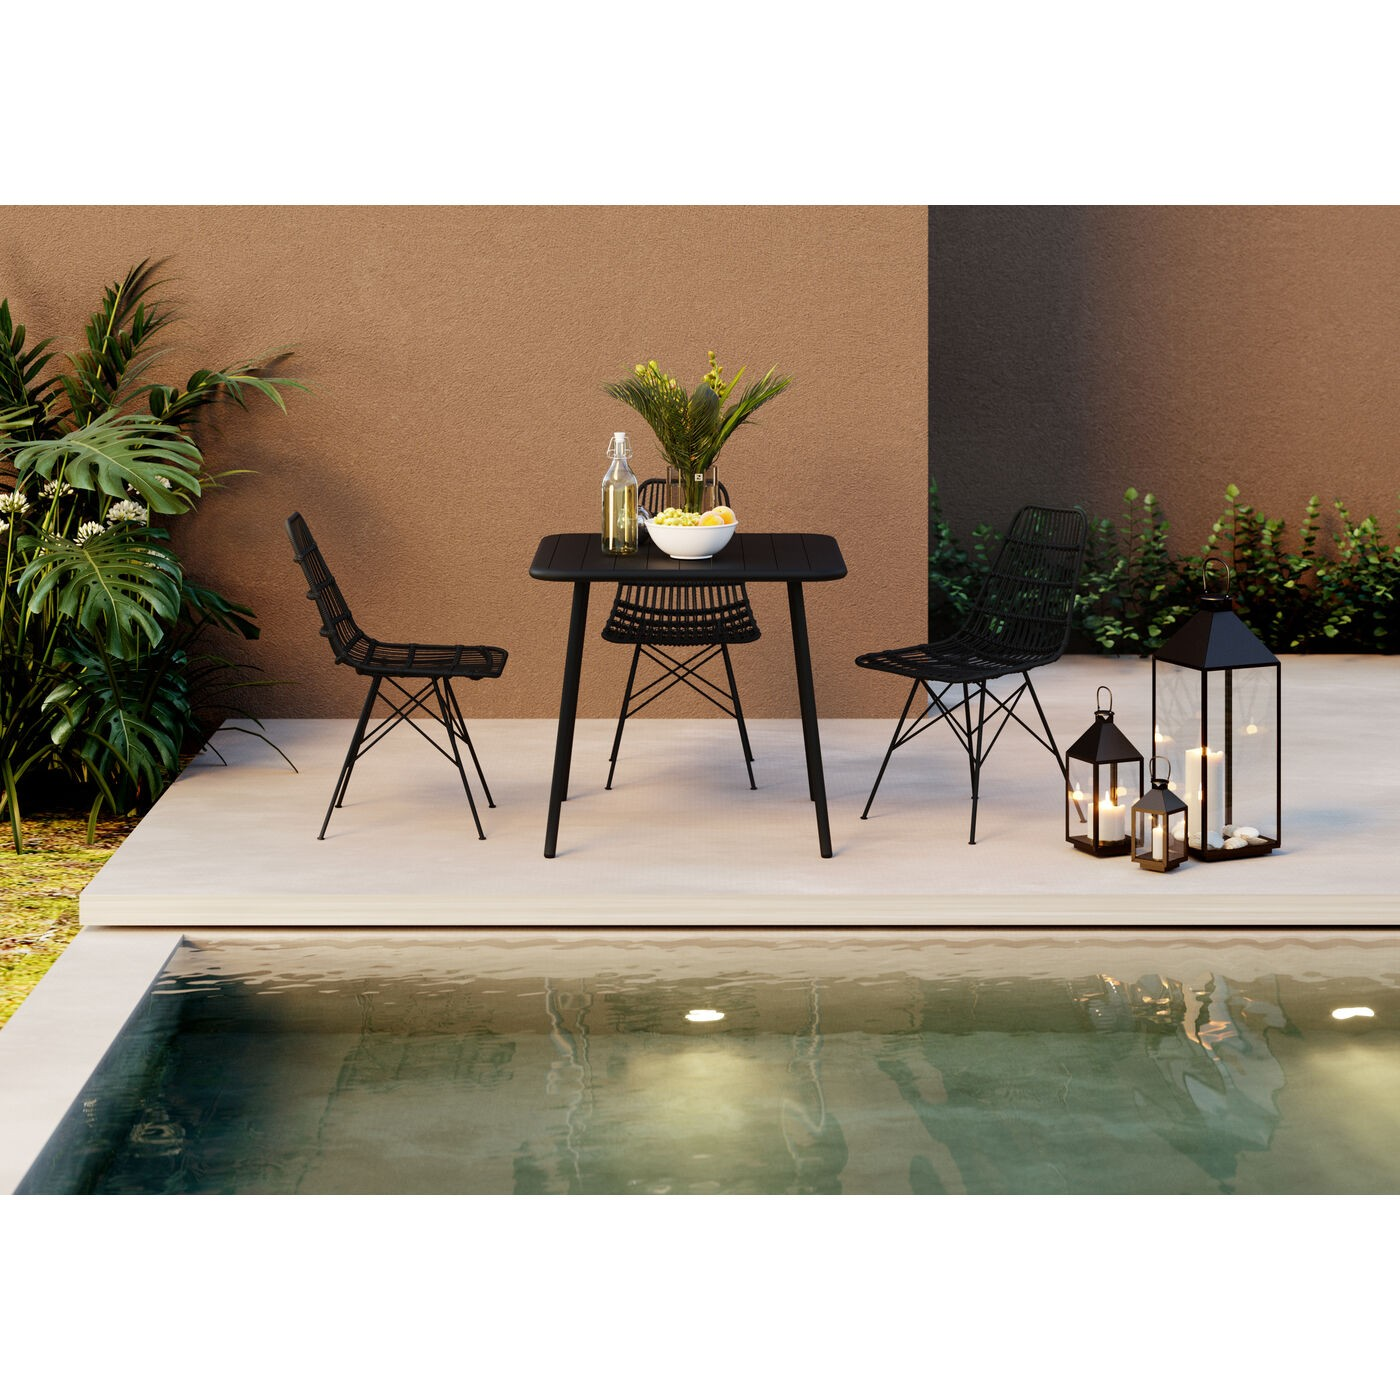 Chaise de jardin Bari grise Kare Design